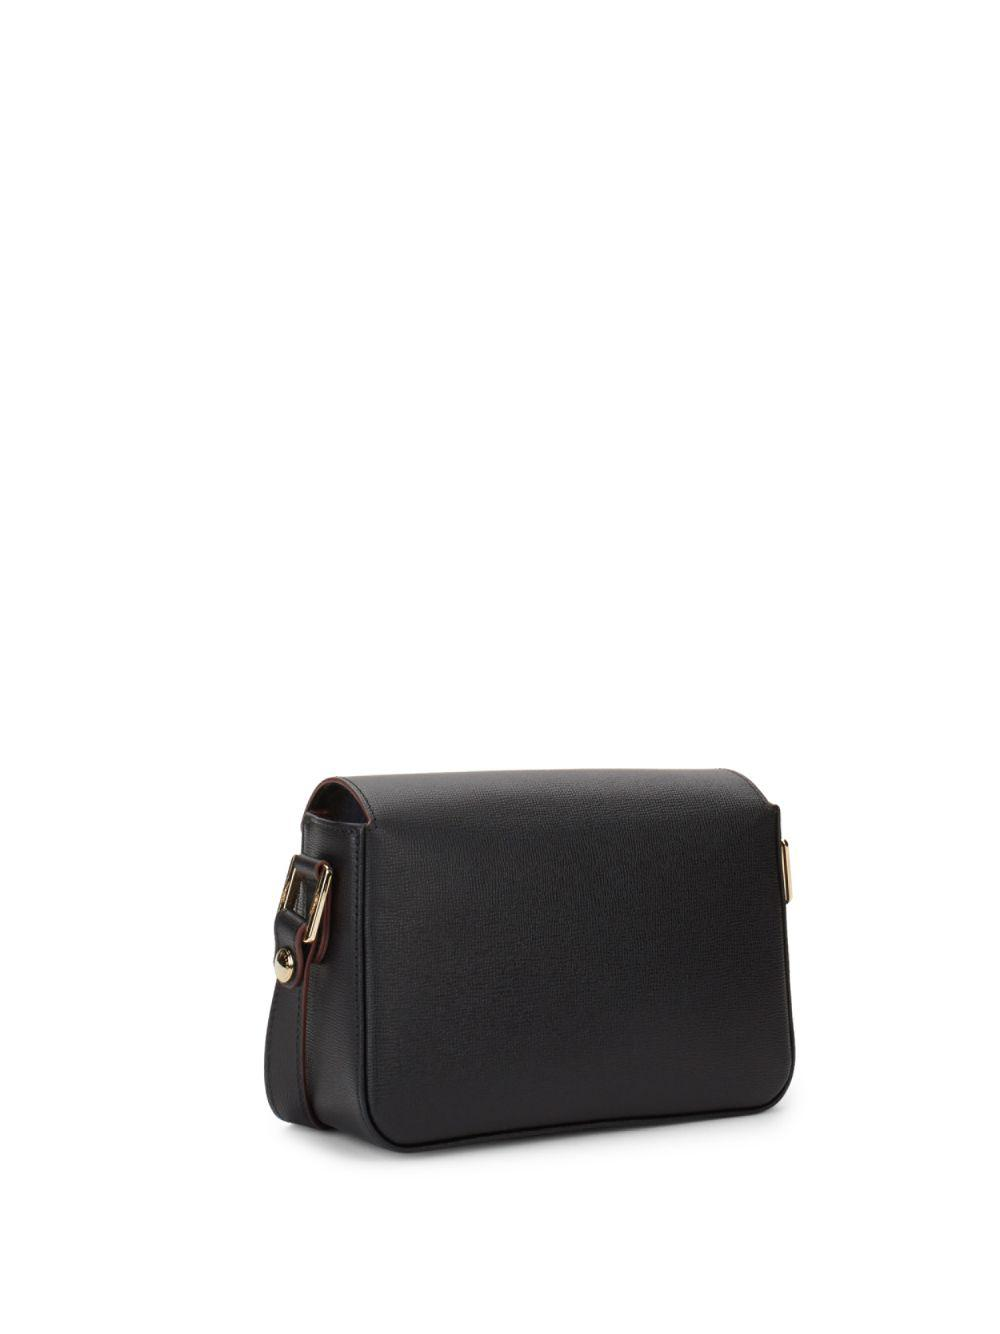 Longchamp Leather Crossbody Bag in Black